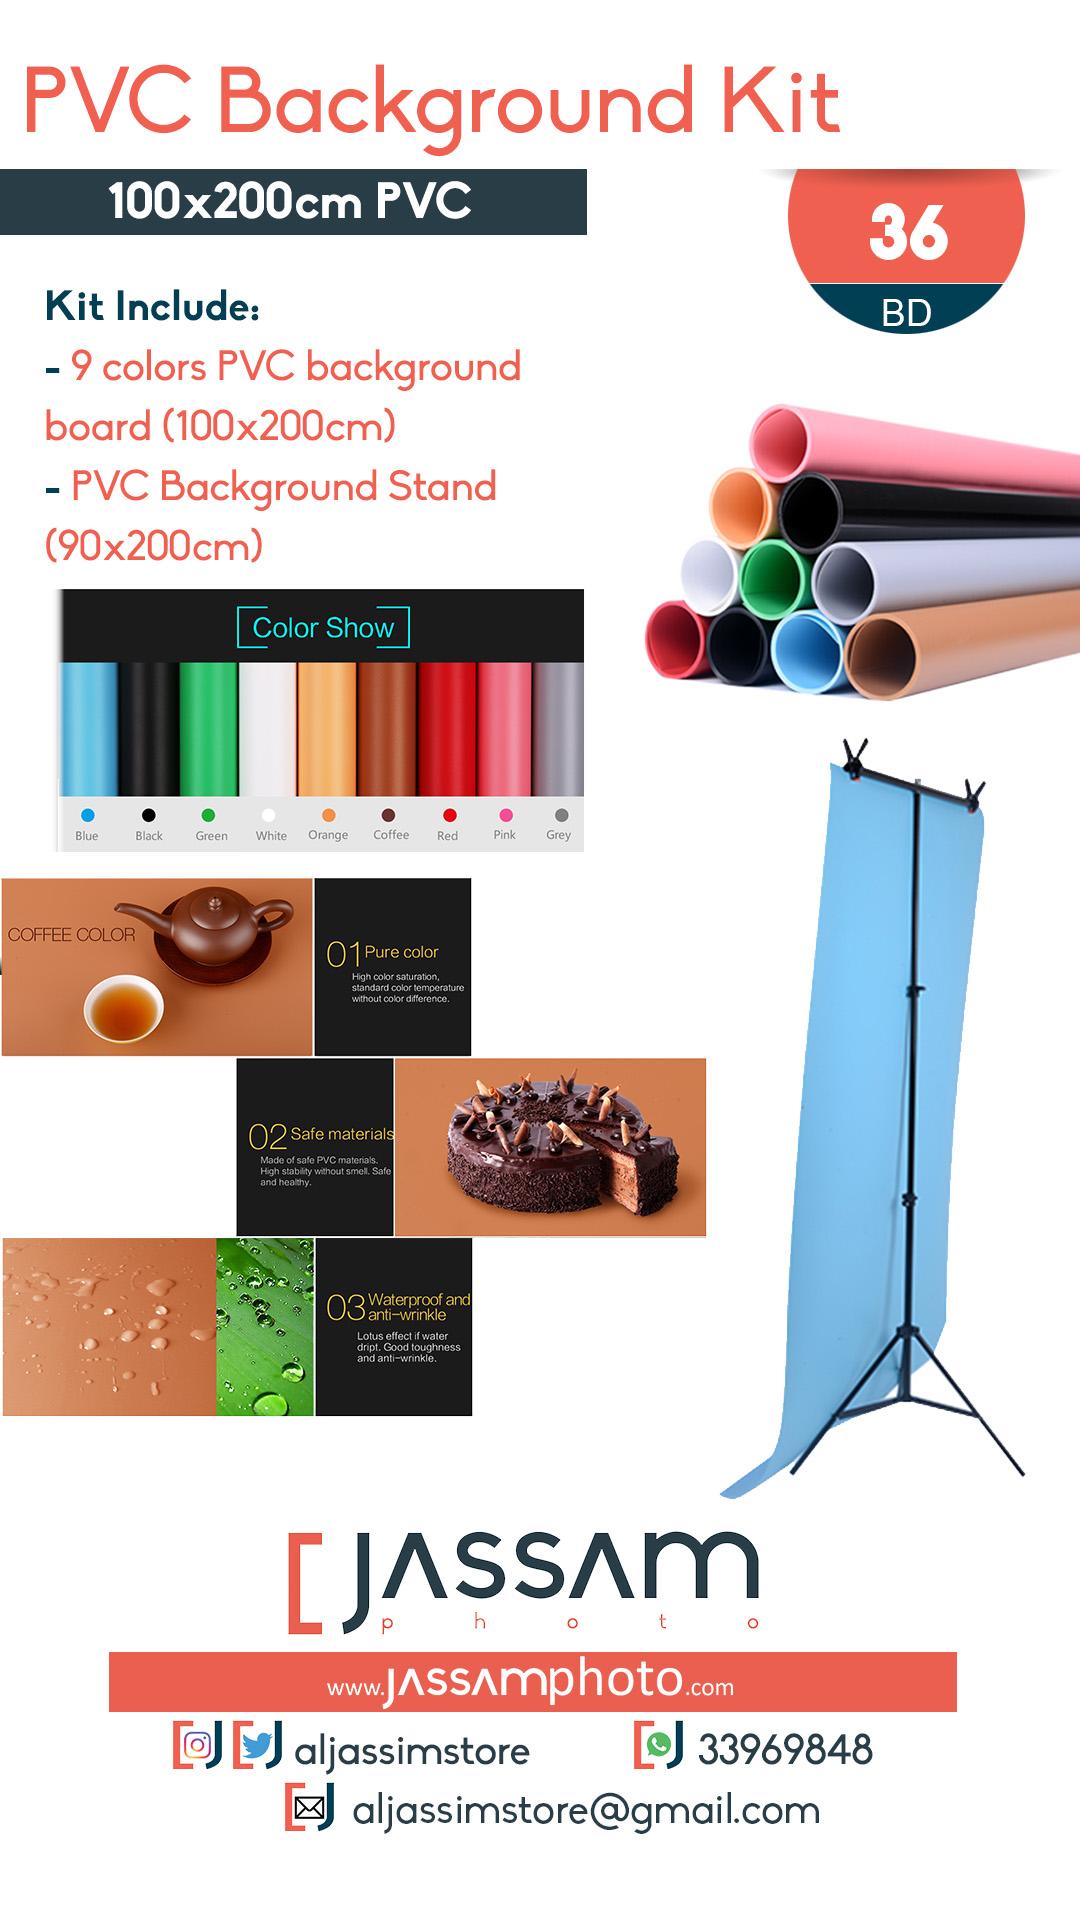 PVC Background Kit